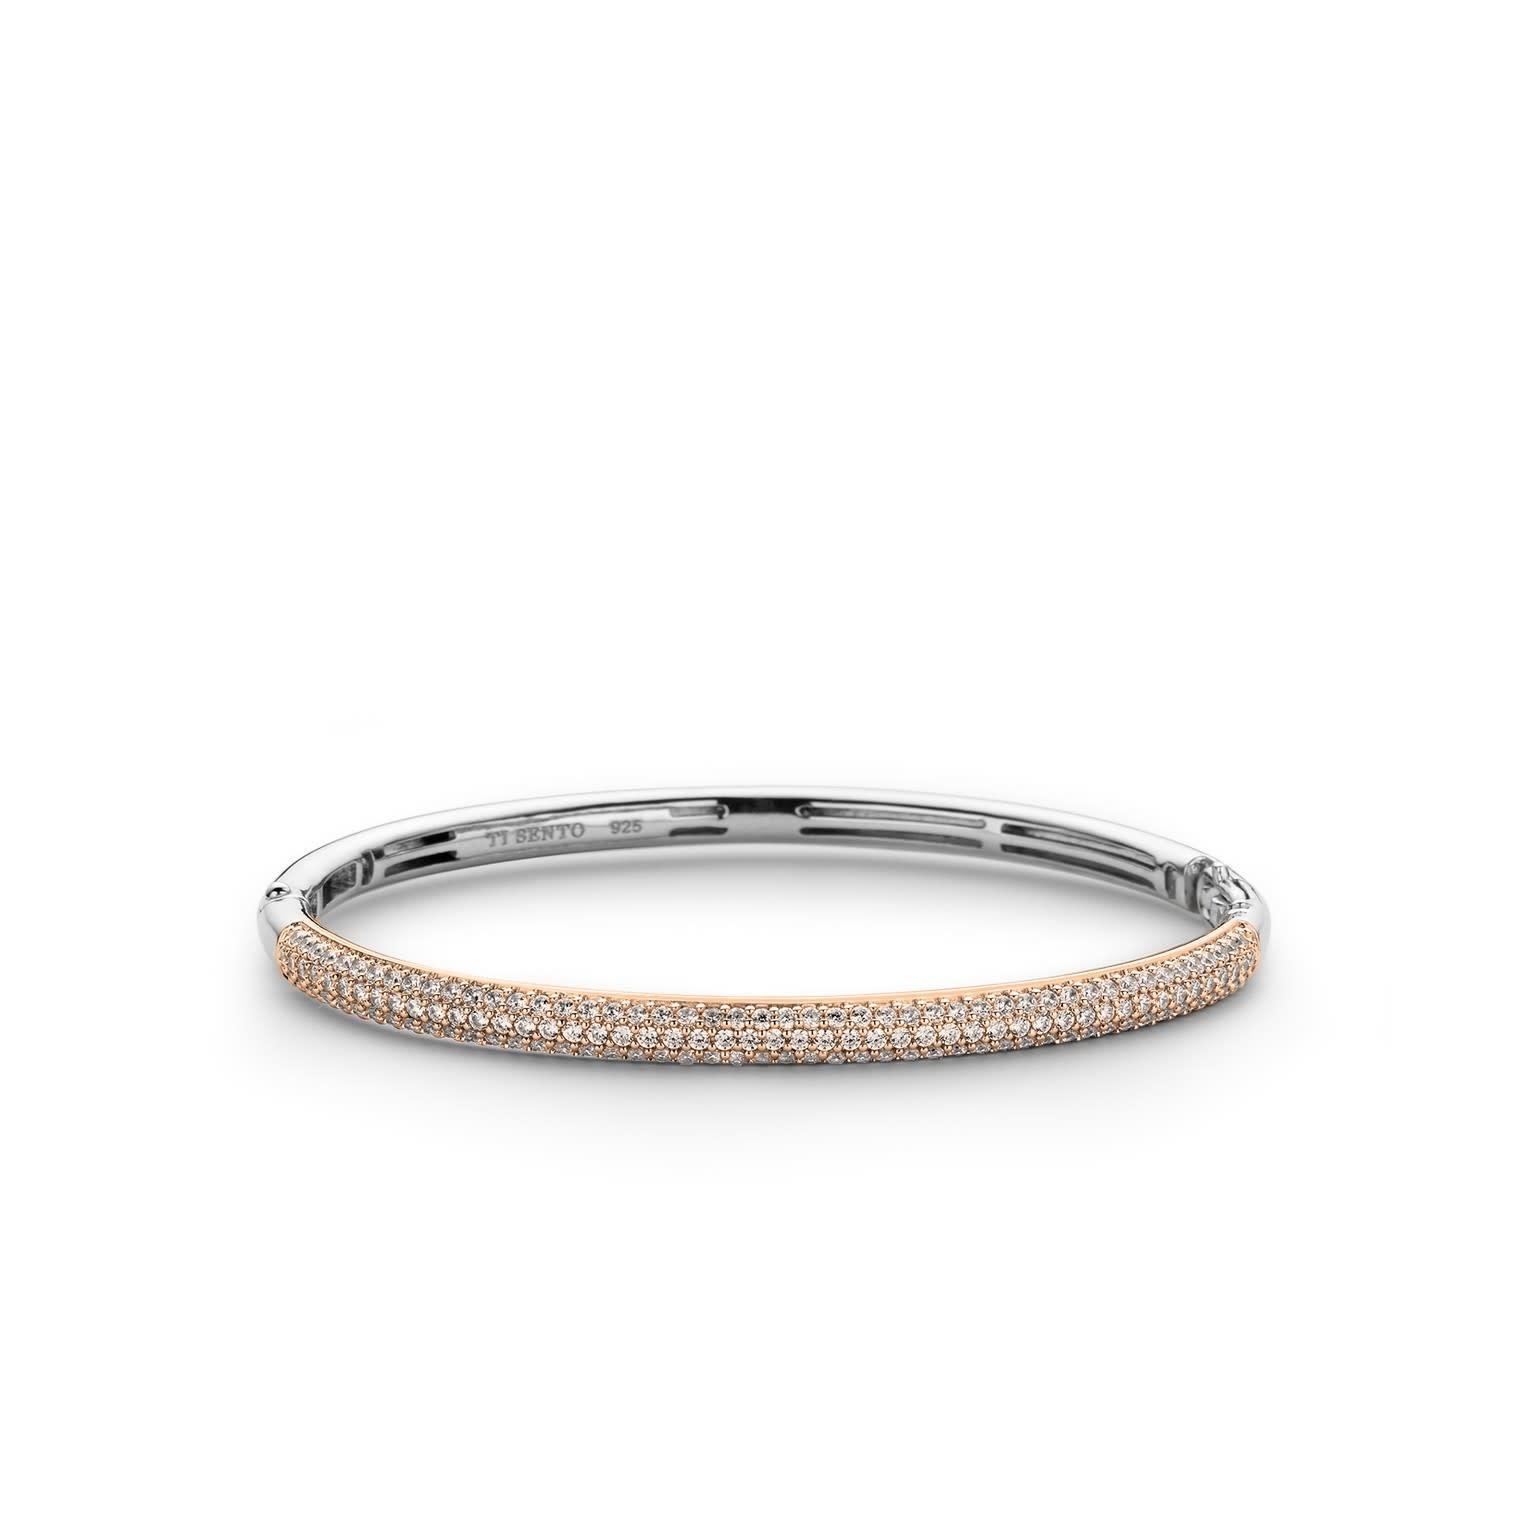 TI SENTO - Milano Bracelet 2874ZR-1